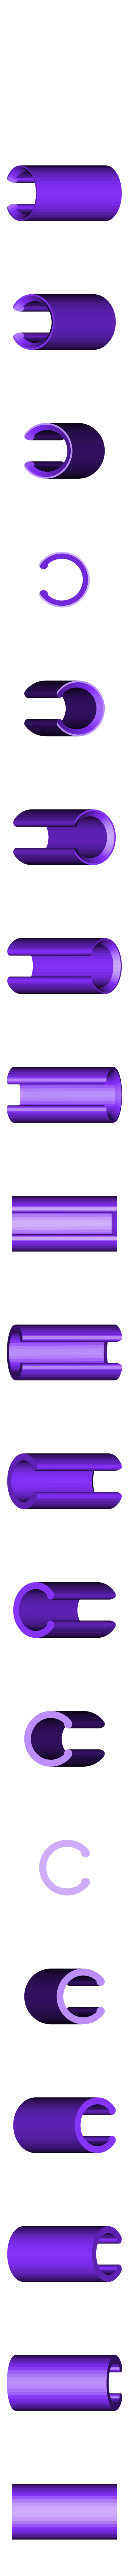 CLIP30.stl Download free STL file THE DOSETTE KEY • 3D printable object, JeremyBarbazaStudio